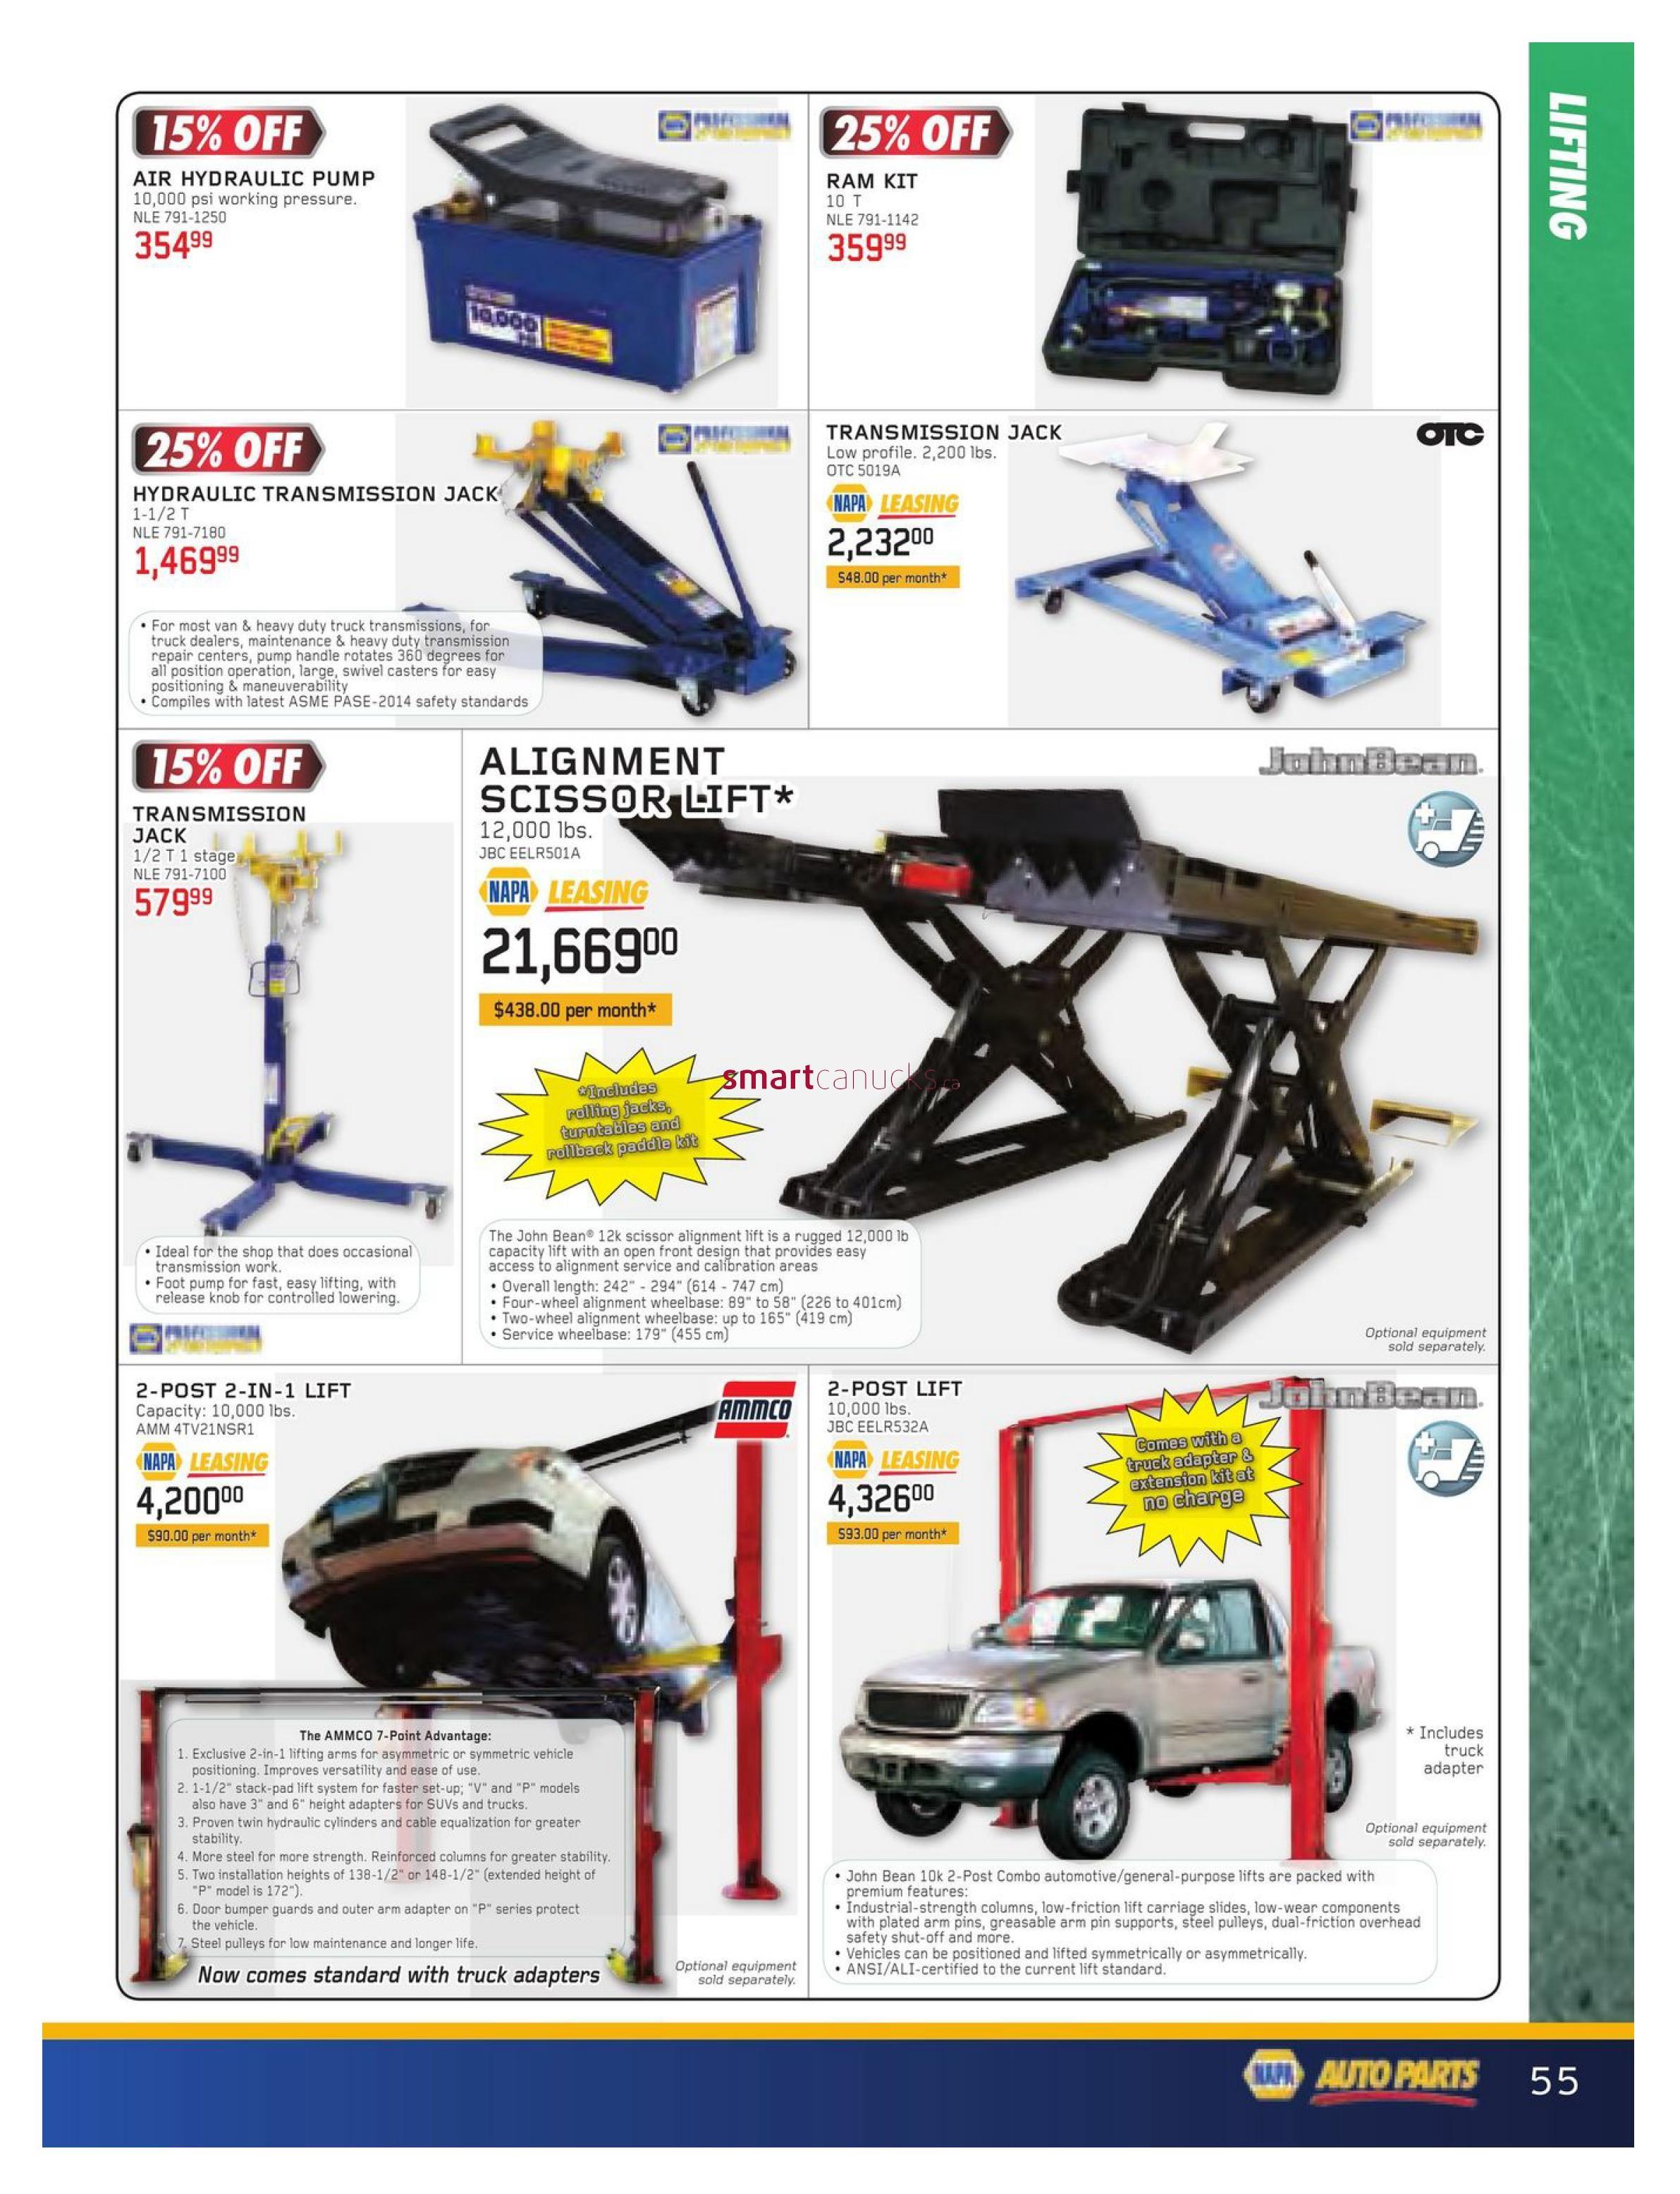 NAPA Auto Parts Real Deals Flyer November 1 to December 31